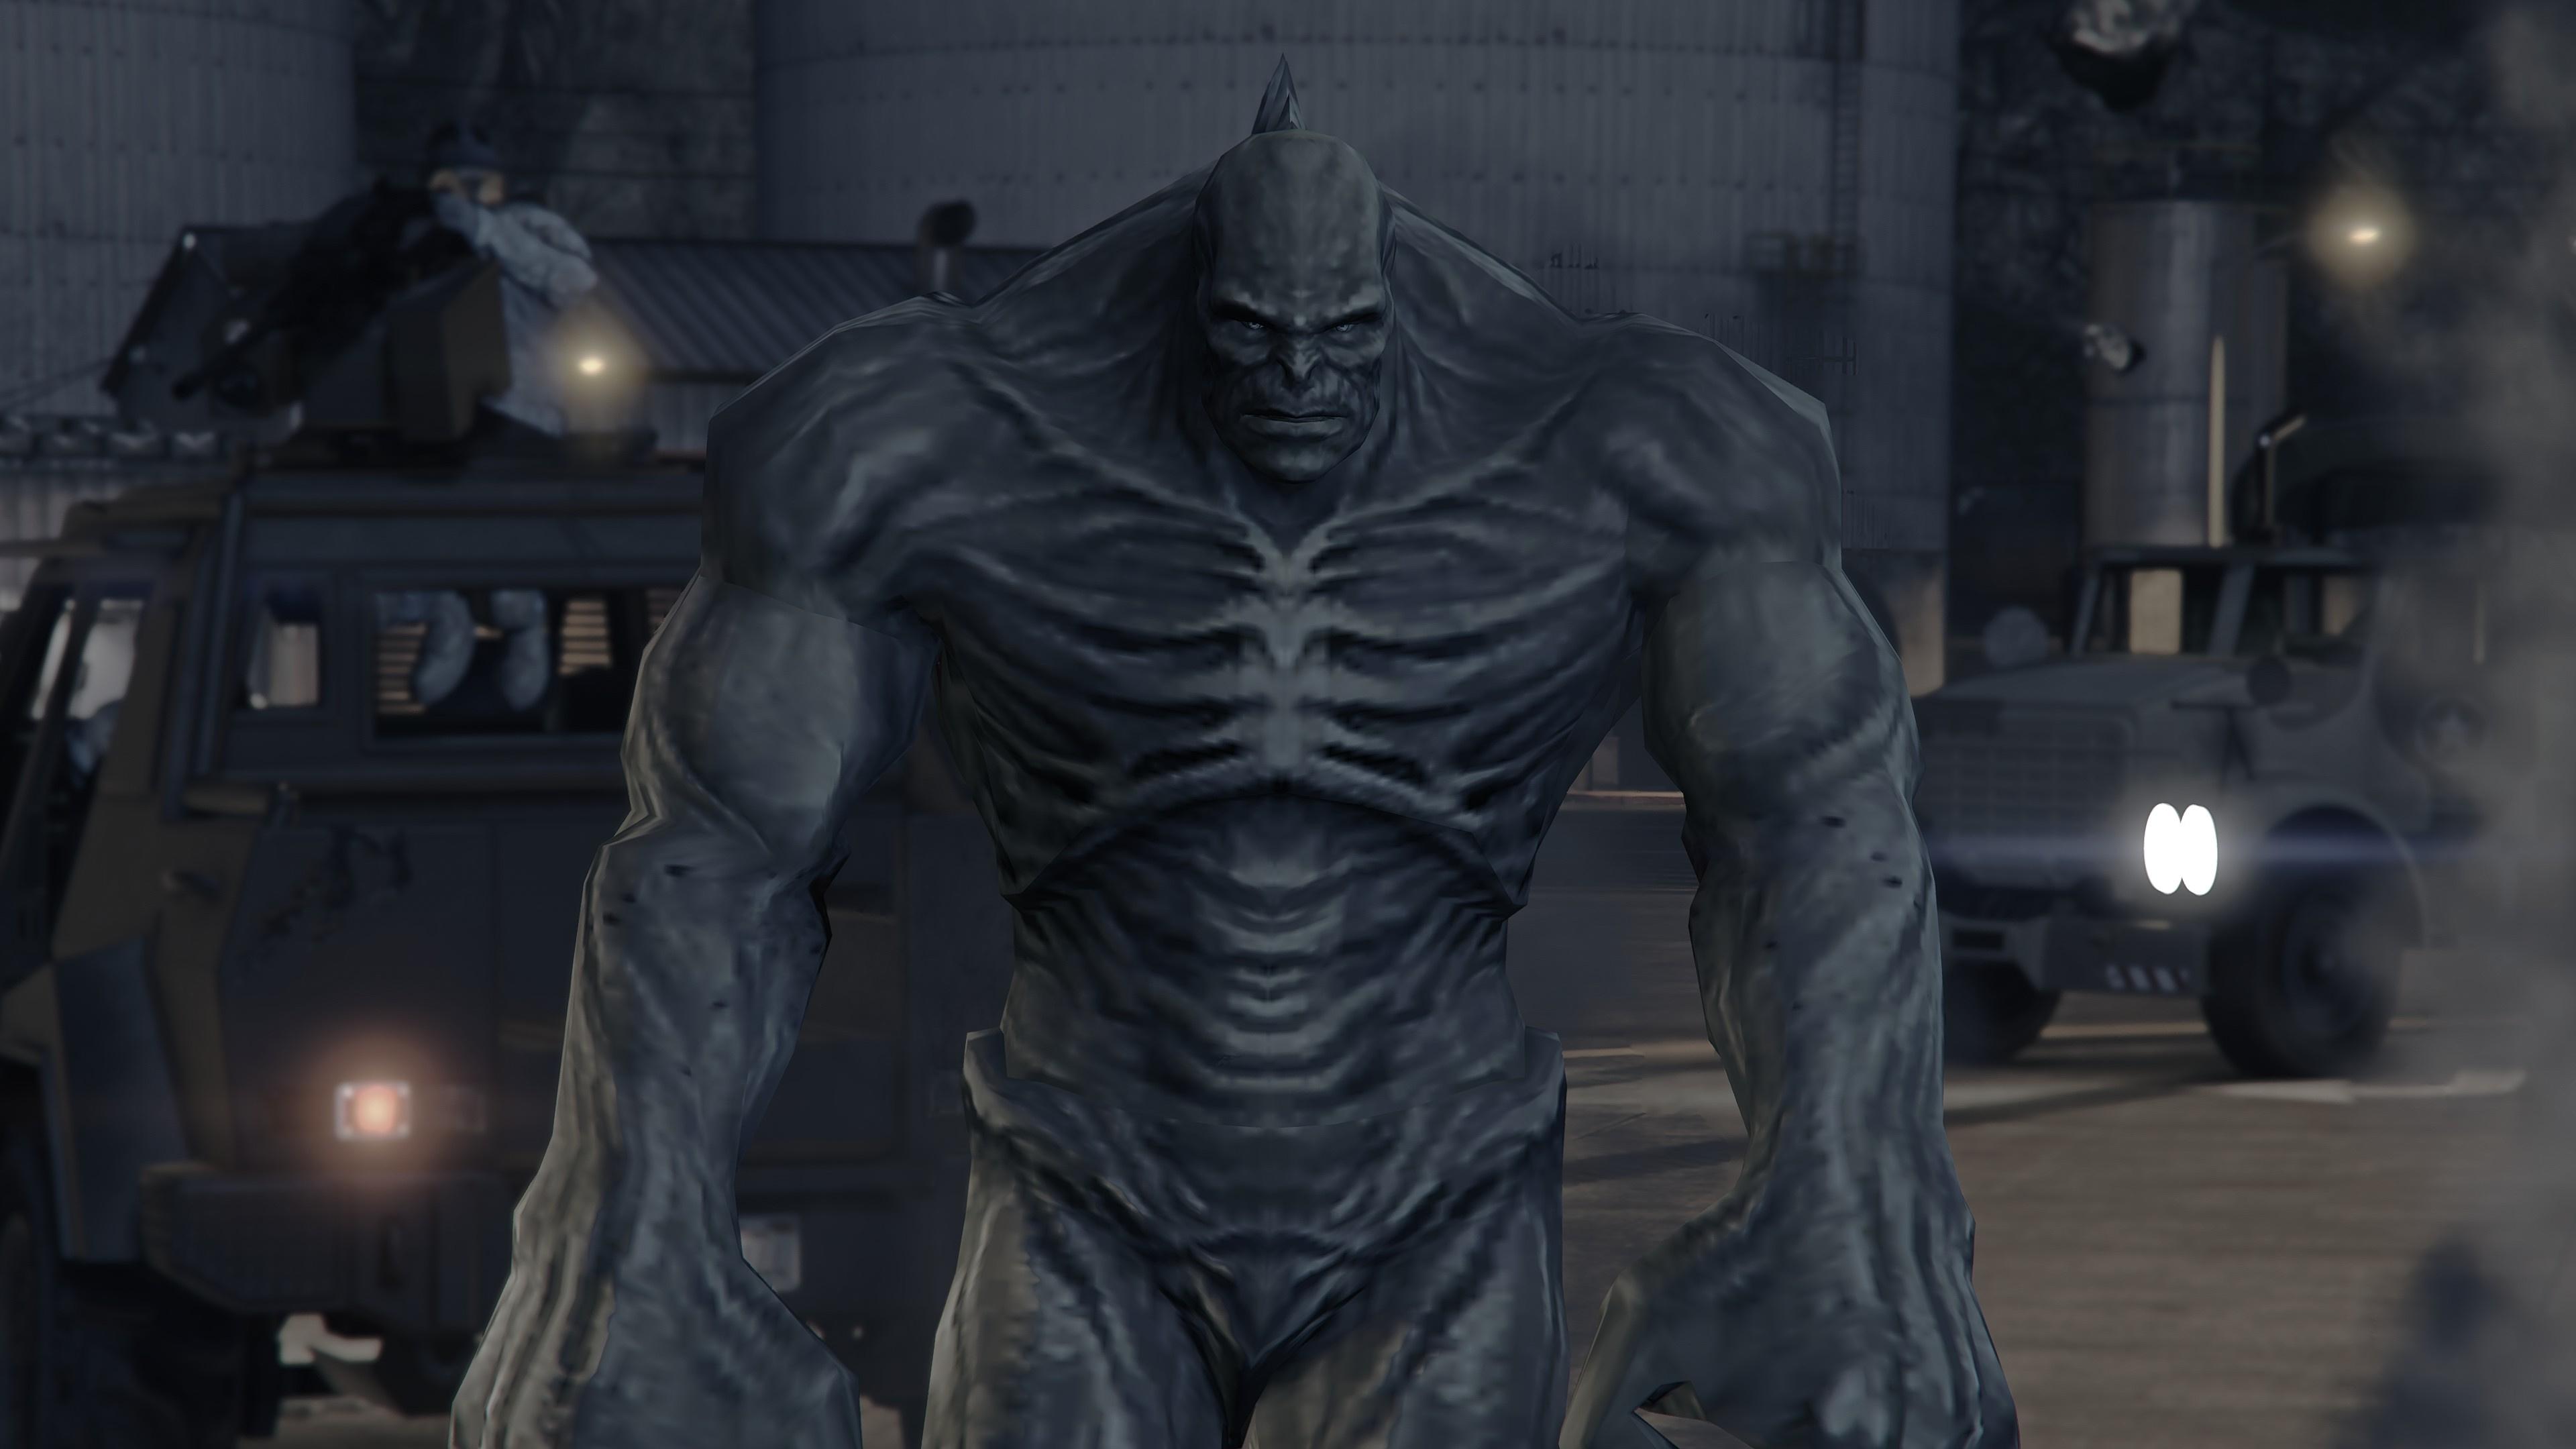 the incredible hulk game apk free download